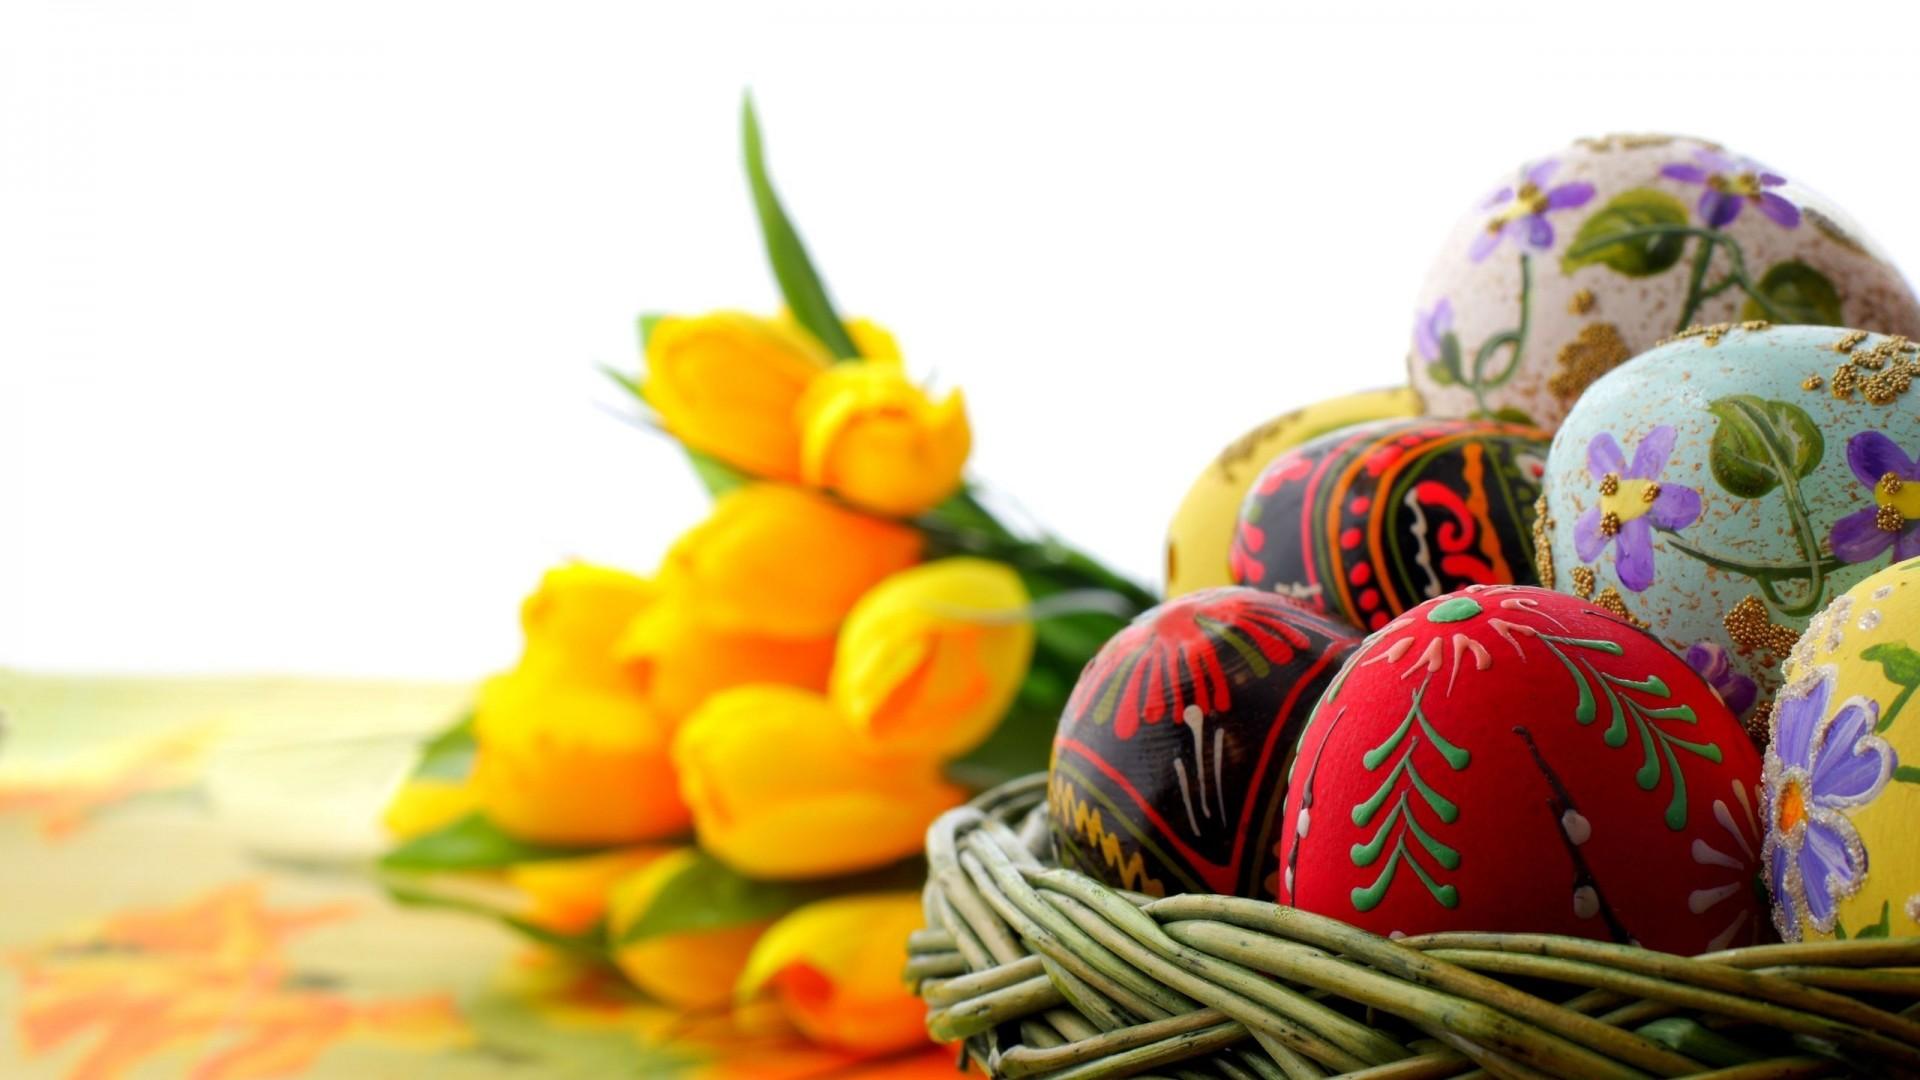 Easter Desktop Wallpapers Backgrounds 1920x1080